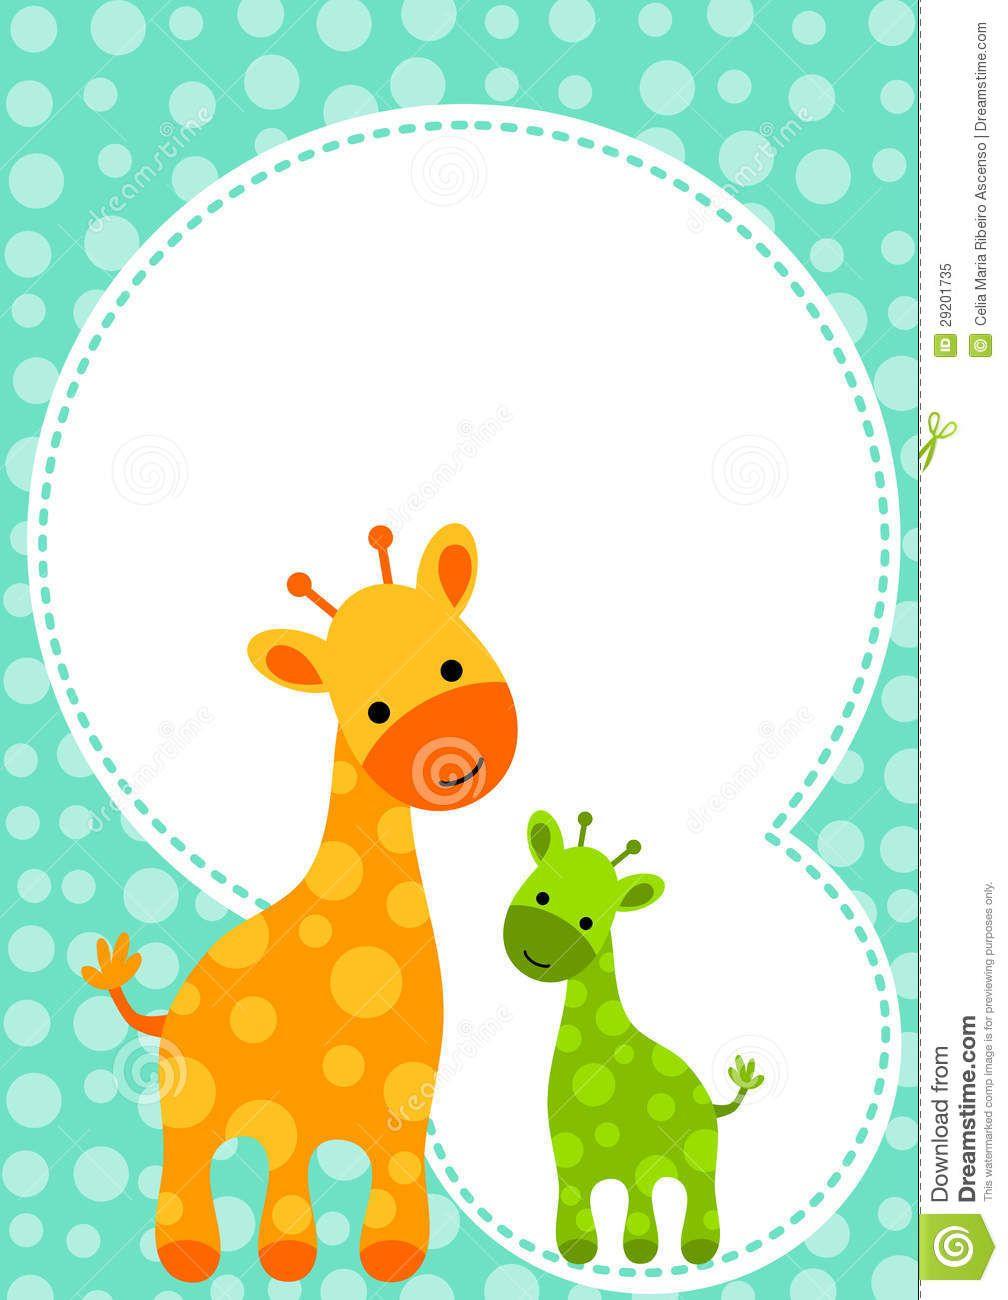 Free Elephant Baby Shower Invitations is beautiful invitations sample